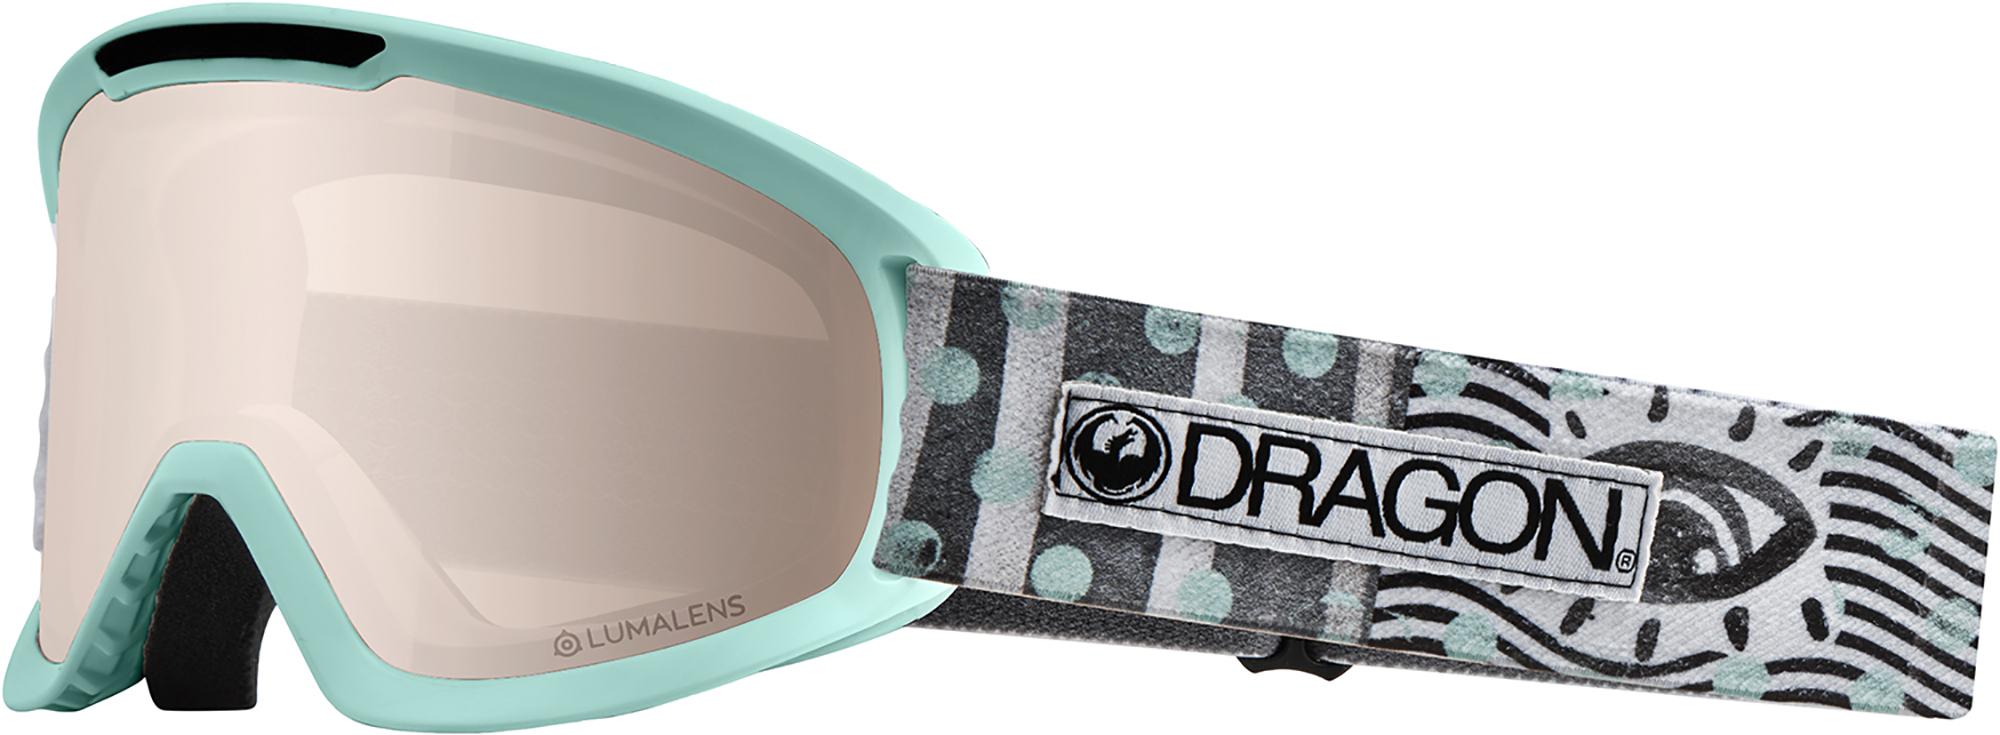 Dragon Маска со сменной линзой Dragon DX2 маска для сноуборда dragon nfxs plot pink ion yellow